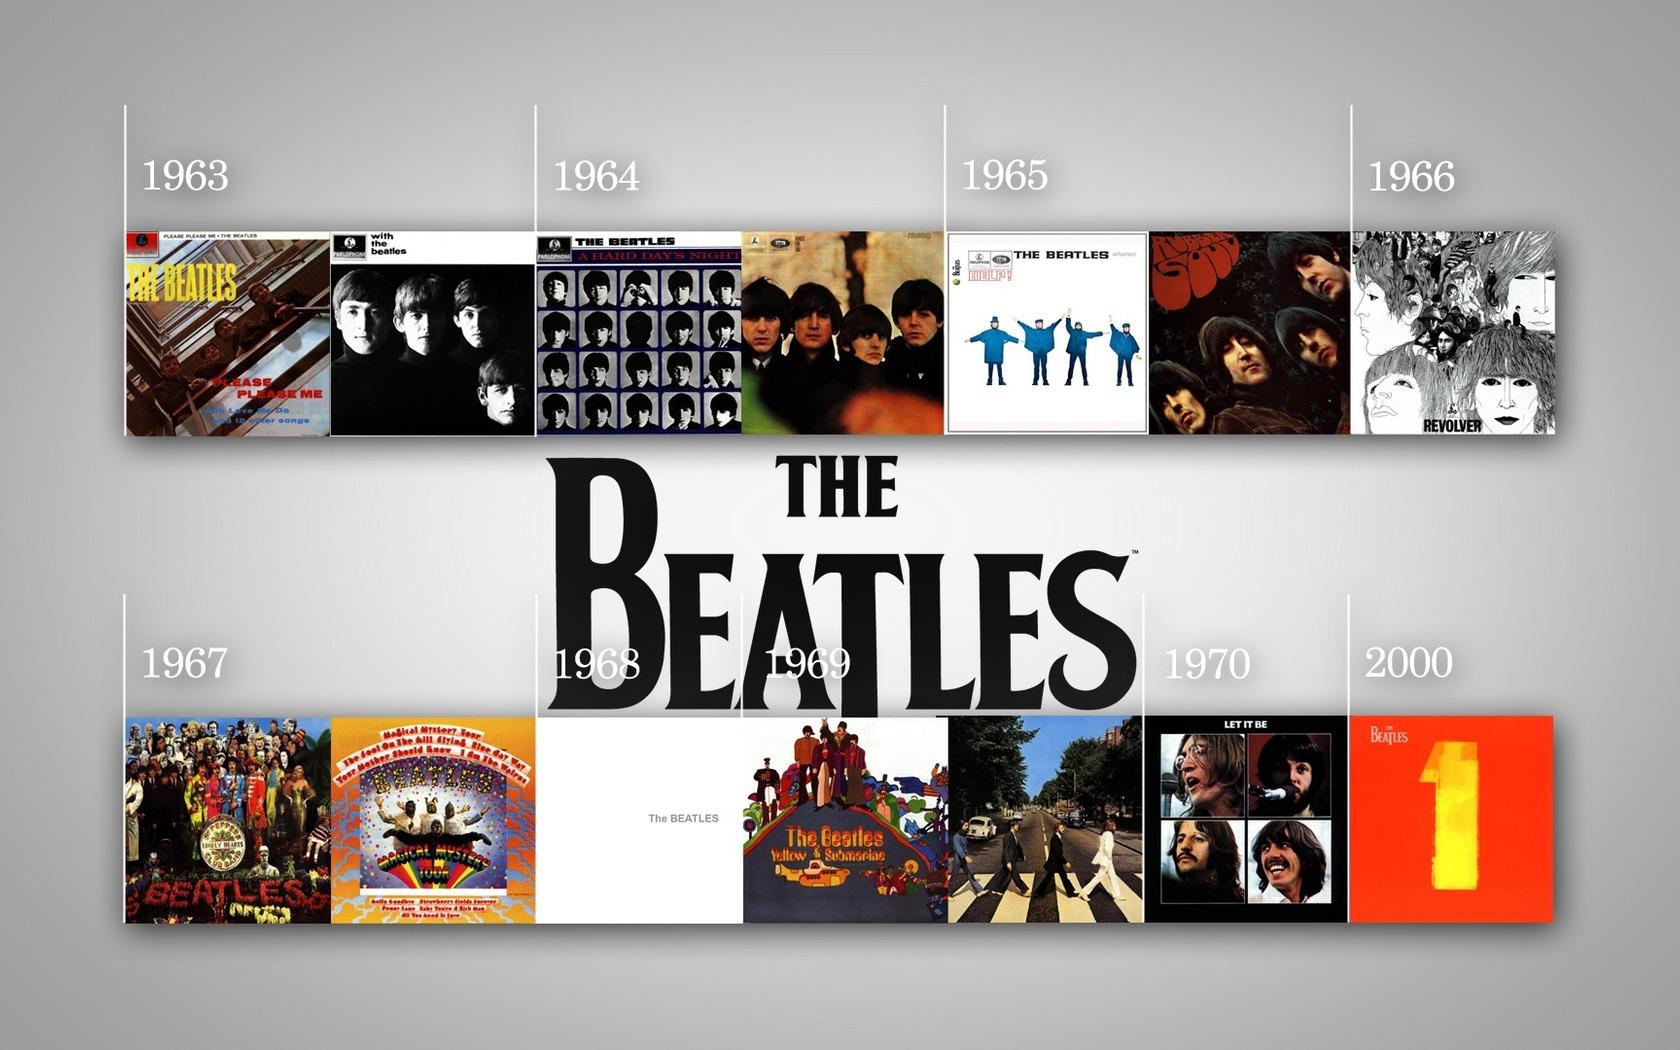 the-beatles-album-covers-wallpaper-4